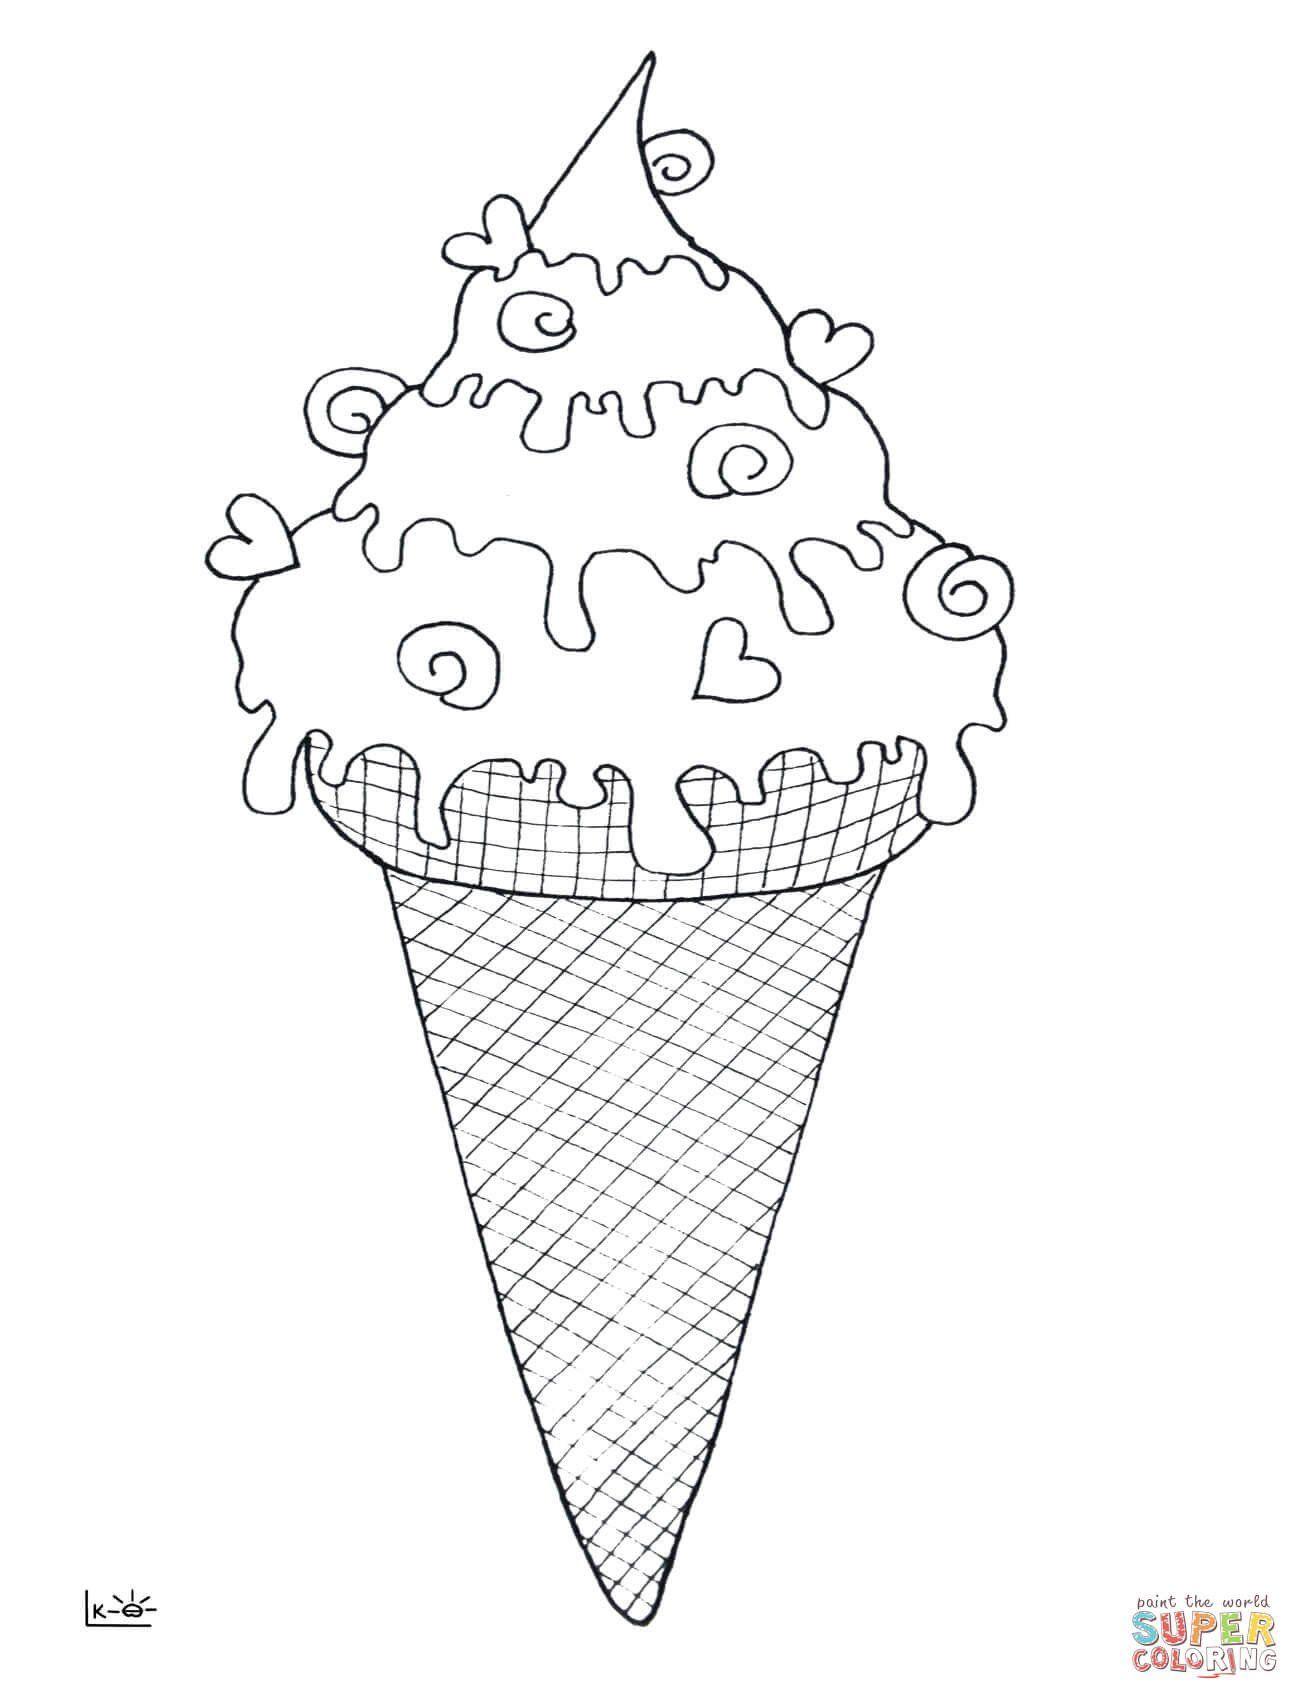 Ice Cream Cones Coloring Page Ice Cream Cone Coloring Page Ice Cream Coloring Pages Cool Coloring Pages Coloring Pages Inspirational